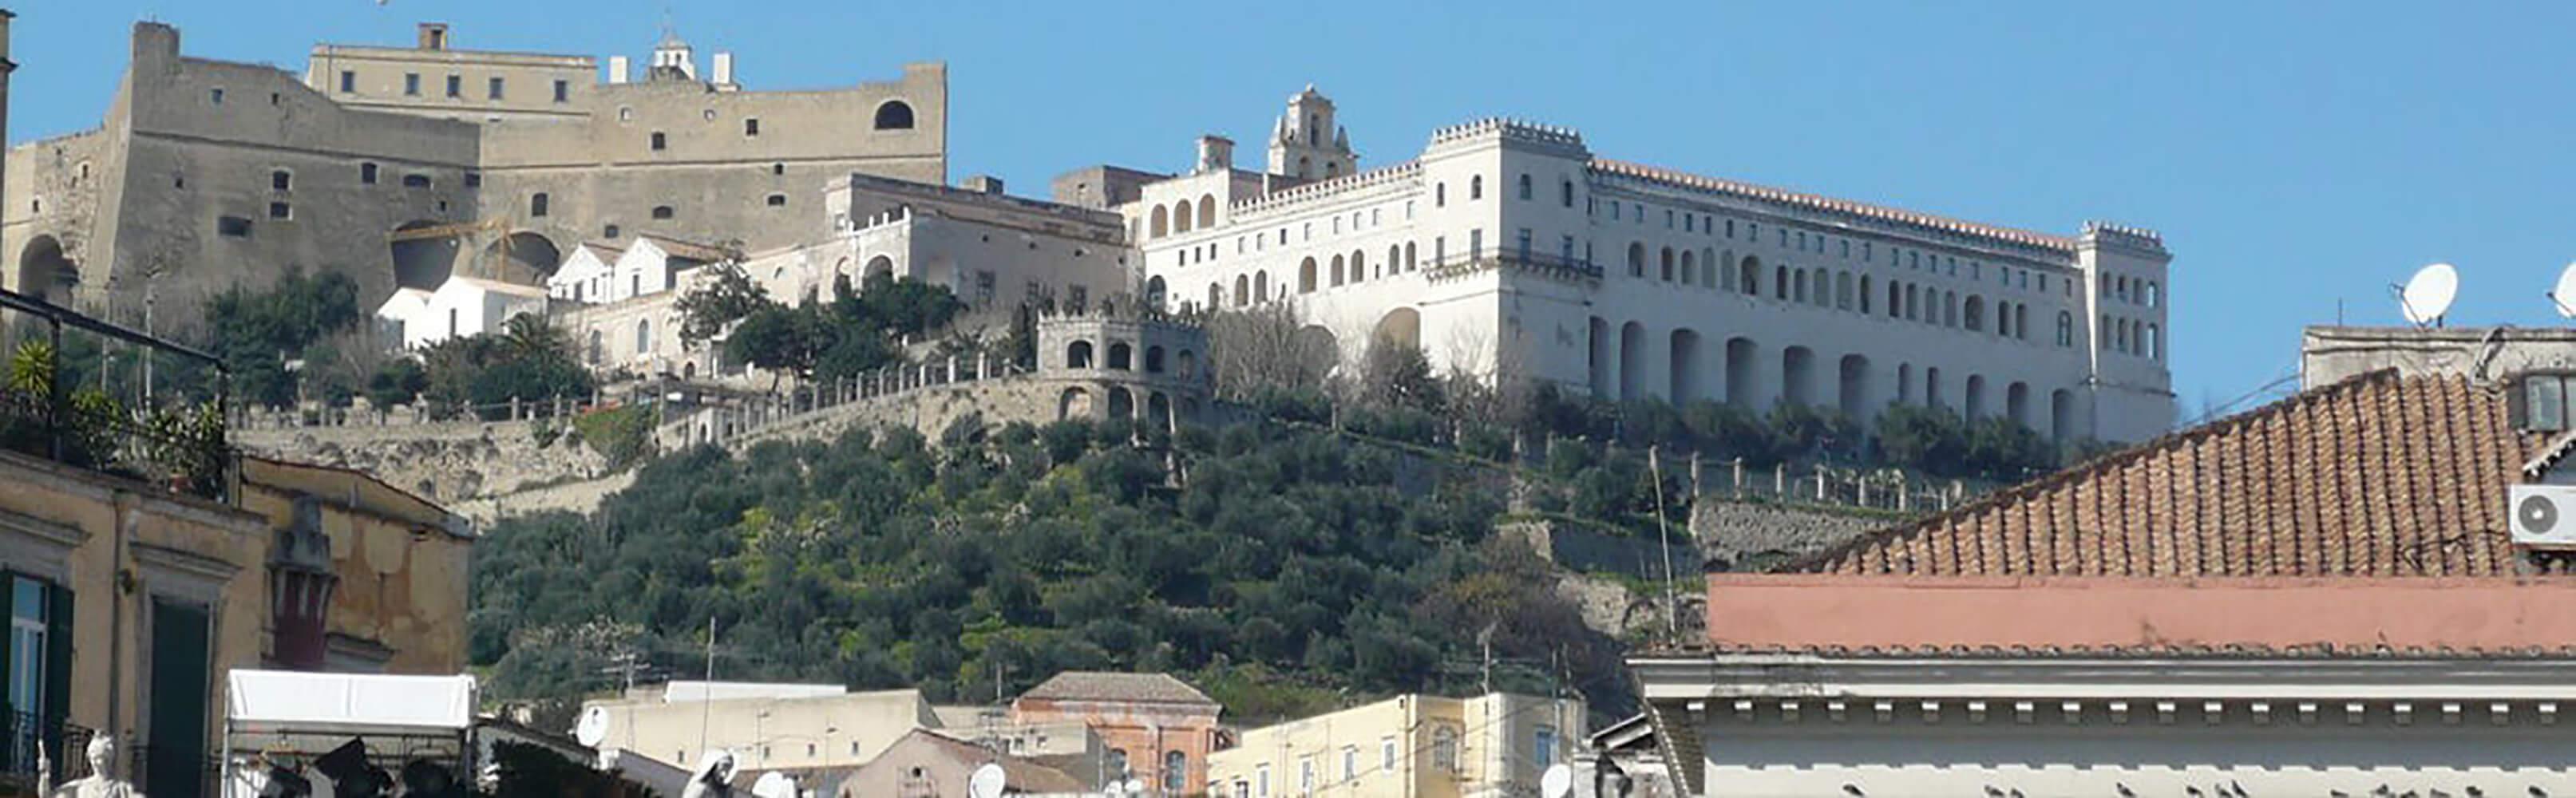 Castel Sant'Elmo 1